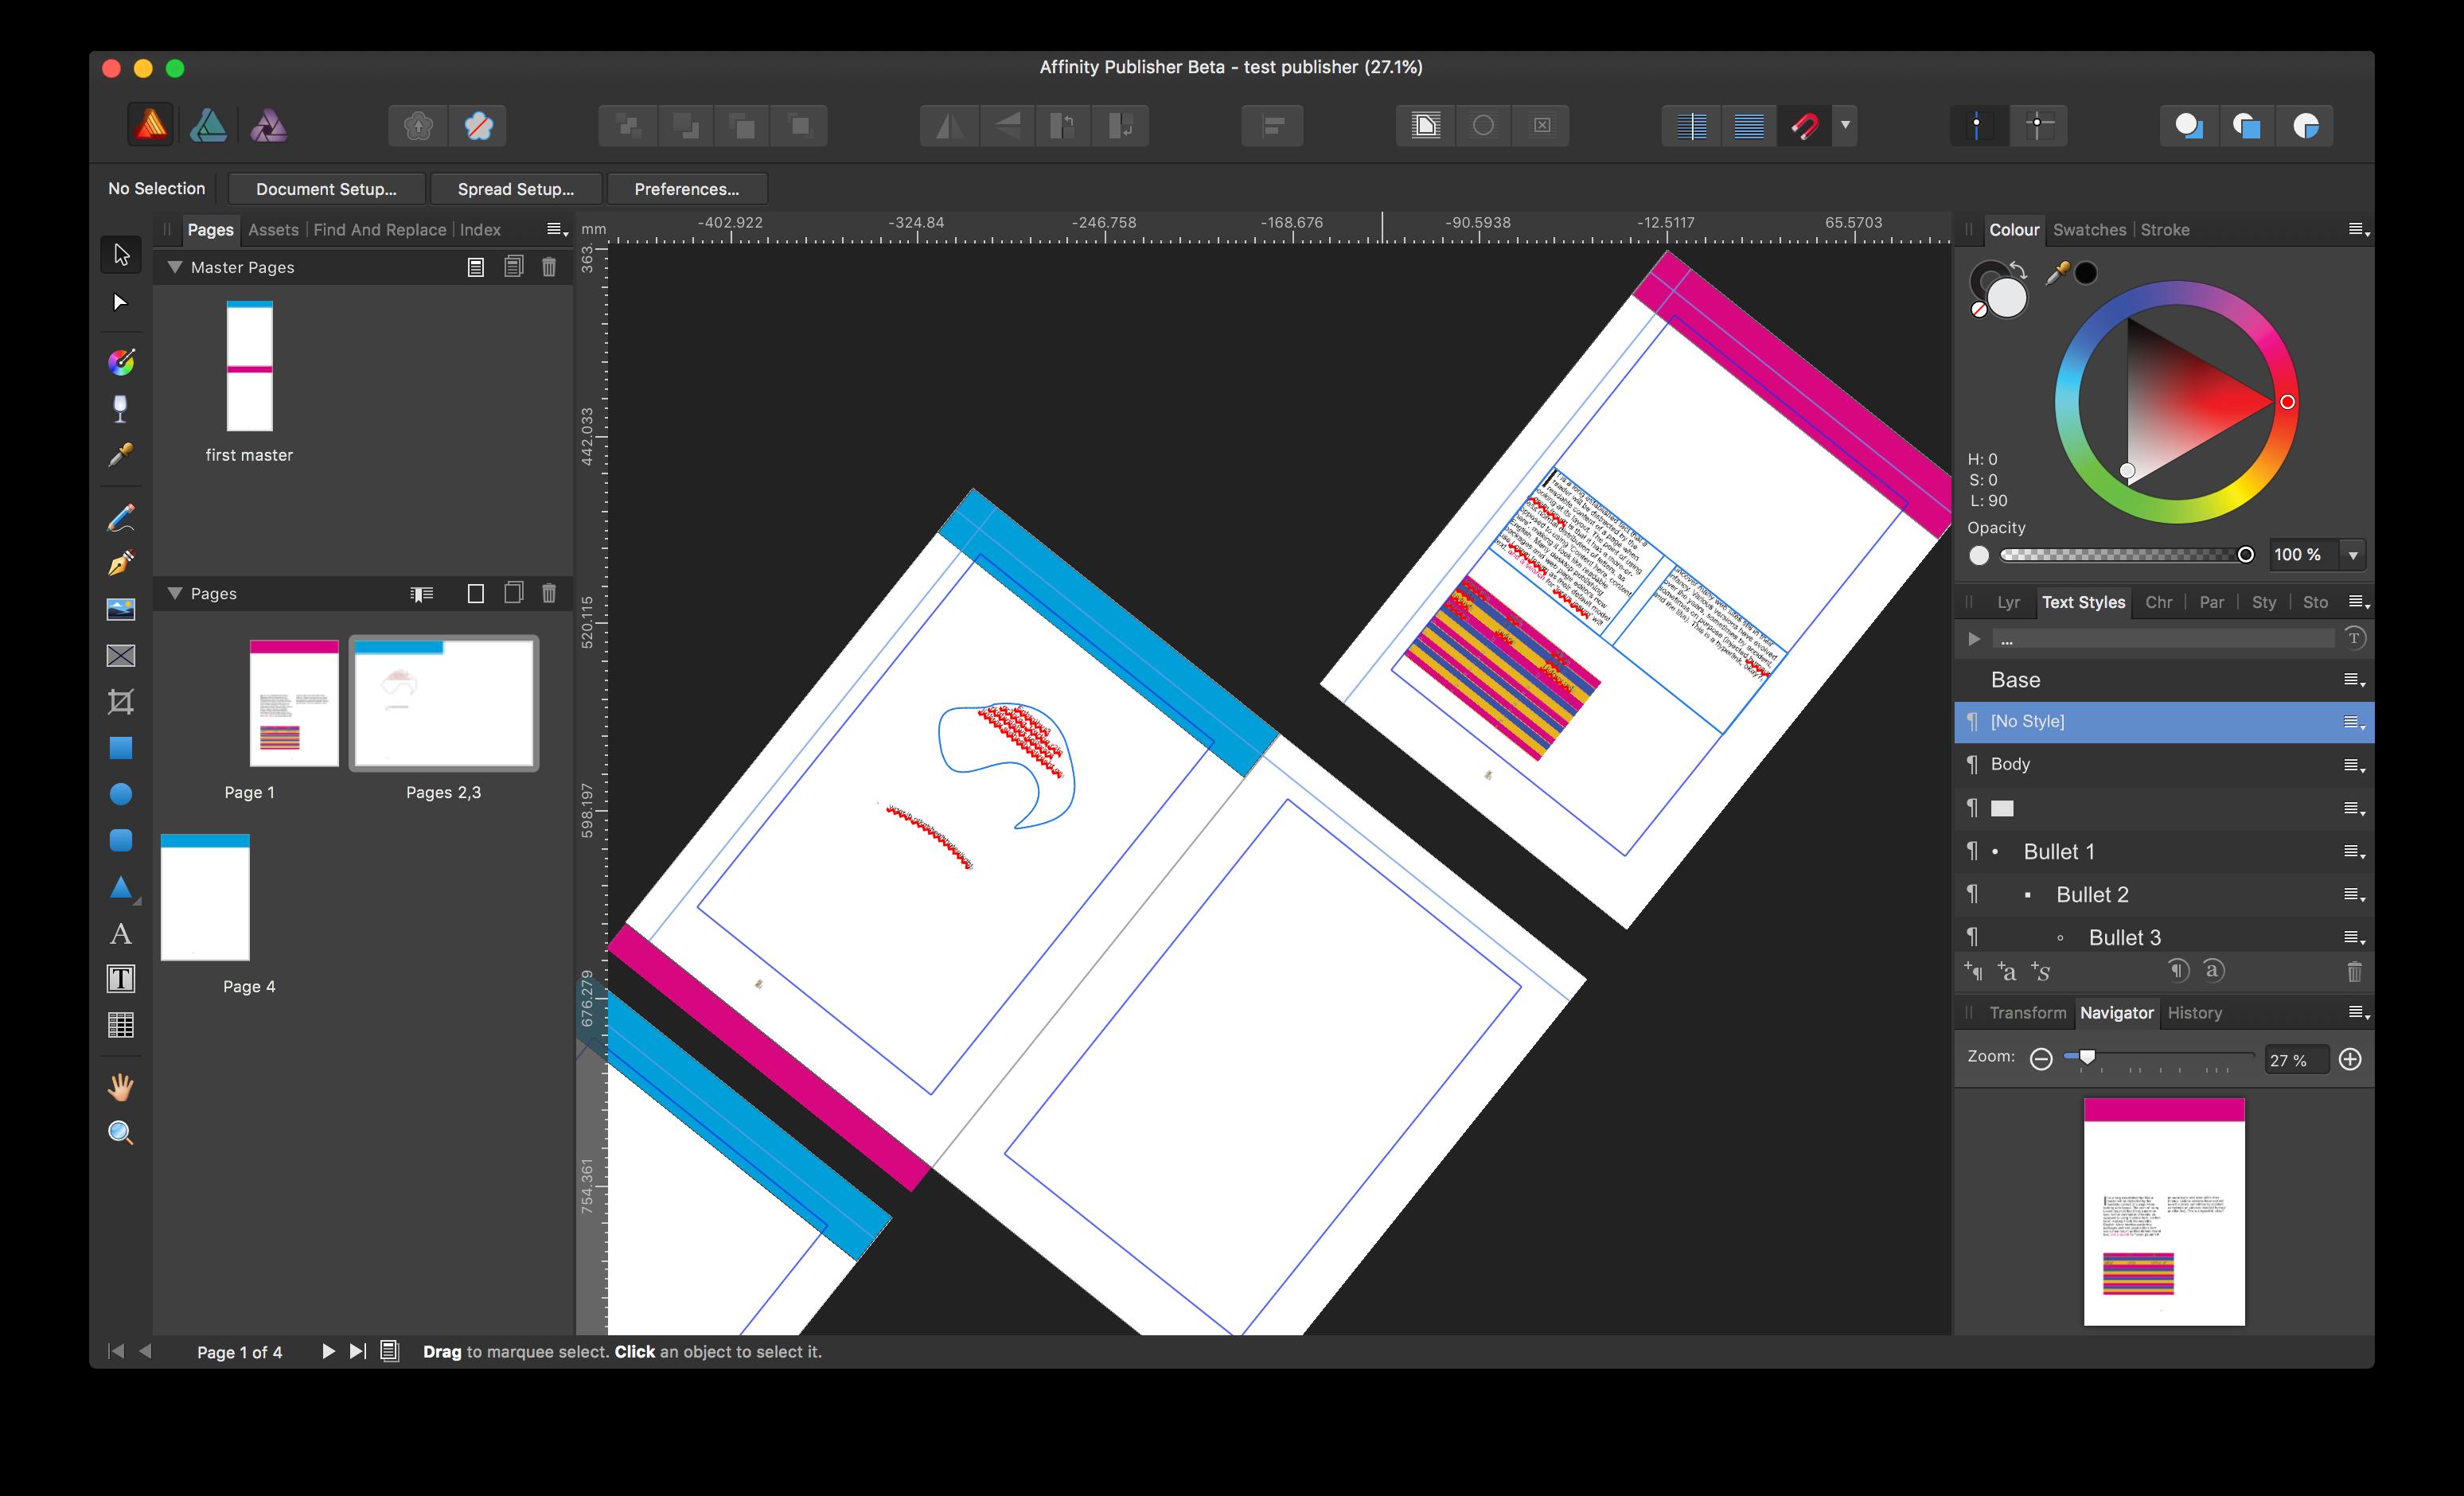 Reset canvas rotation? - Publisher beta on Mac - Affinity